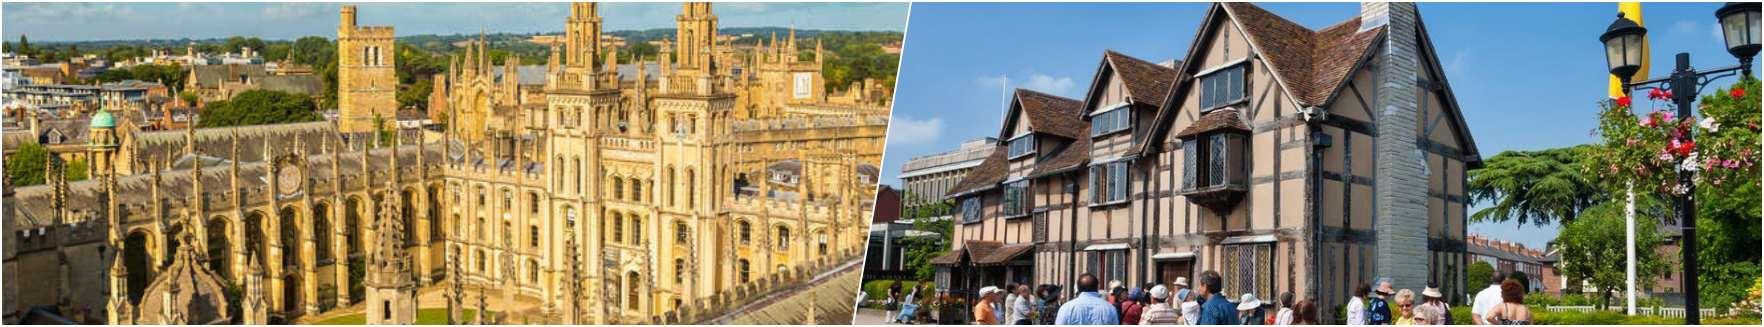 Oxford-Stratford upon Avon